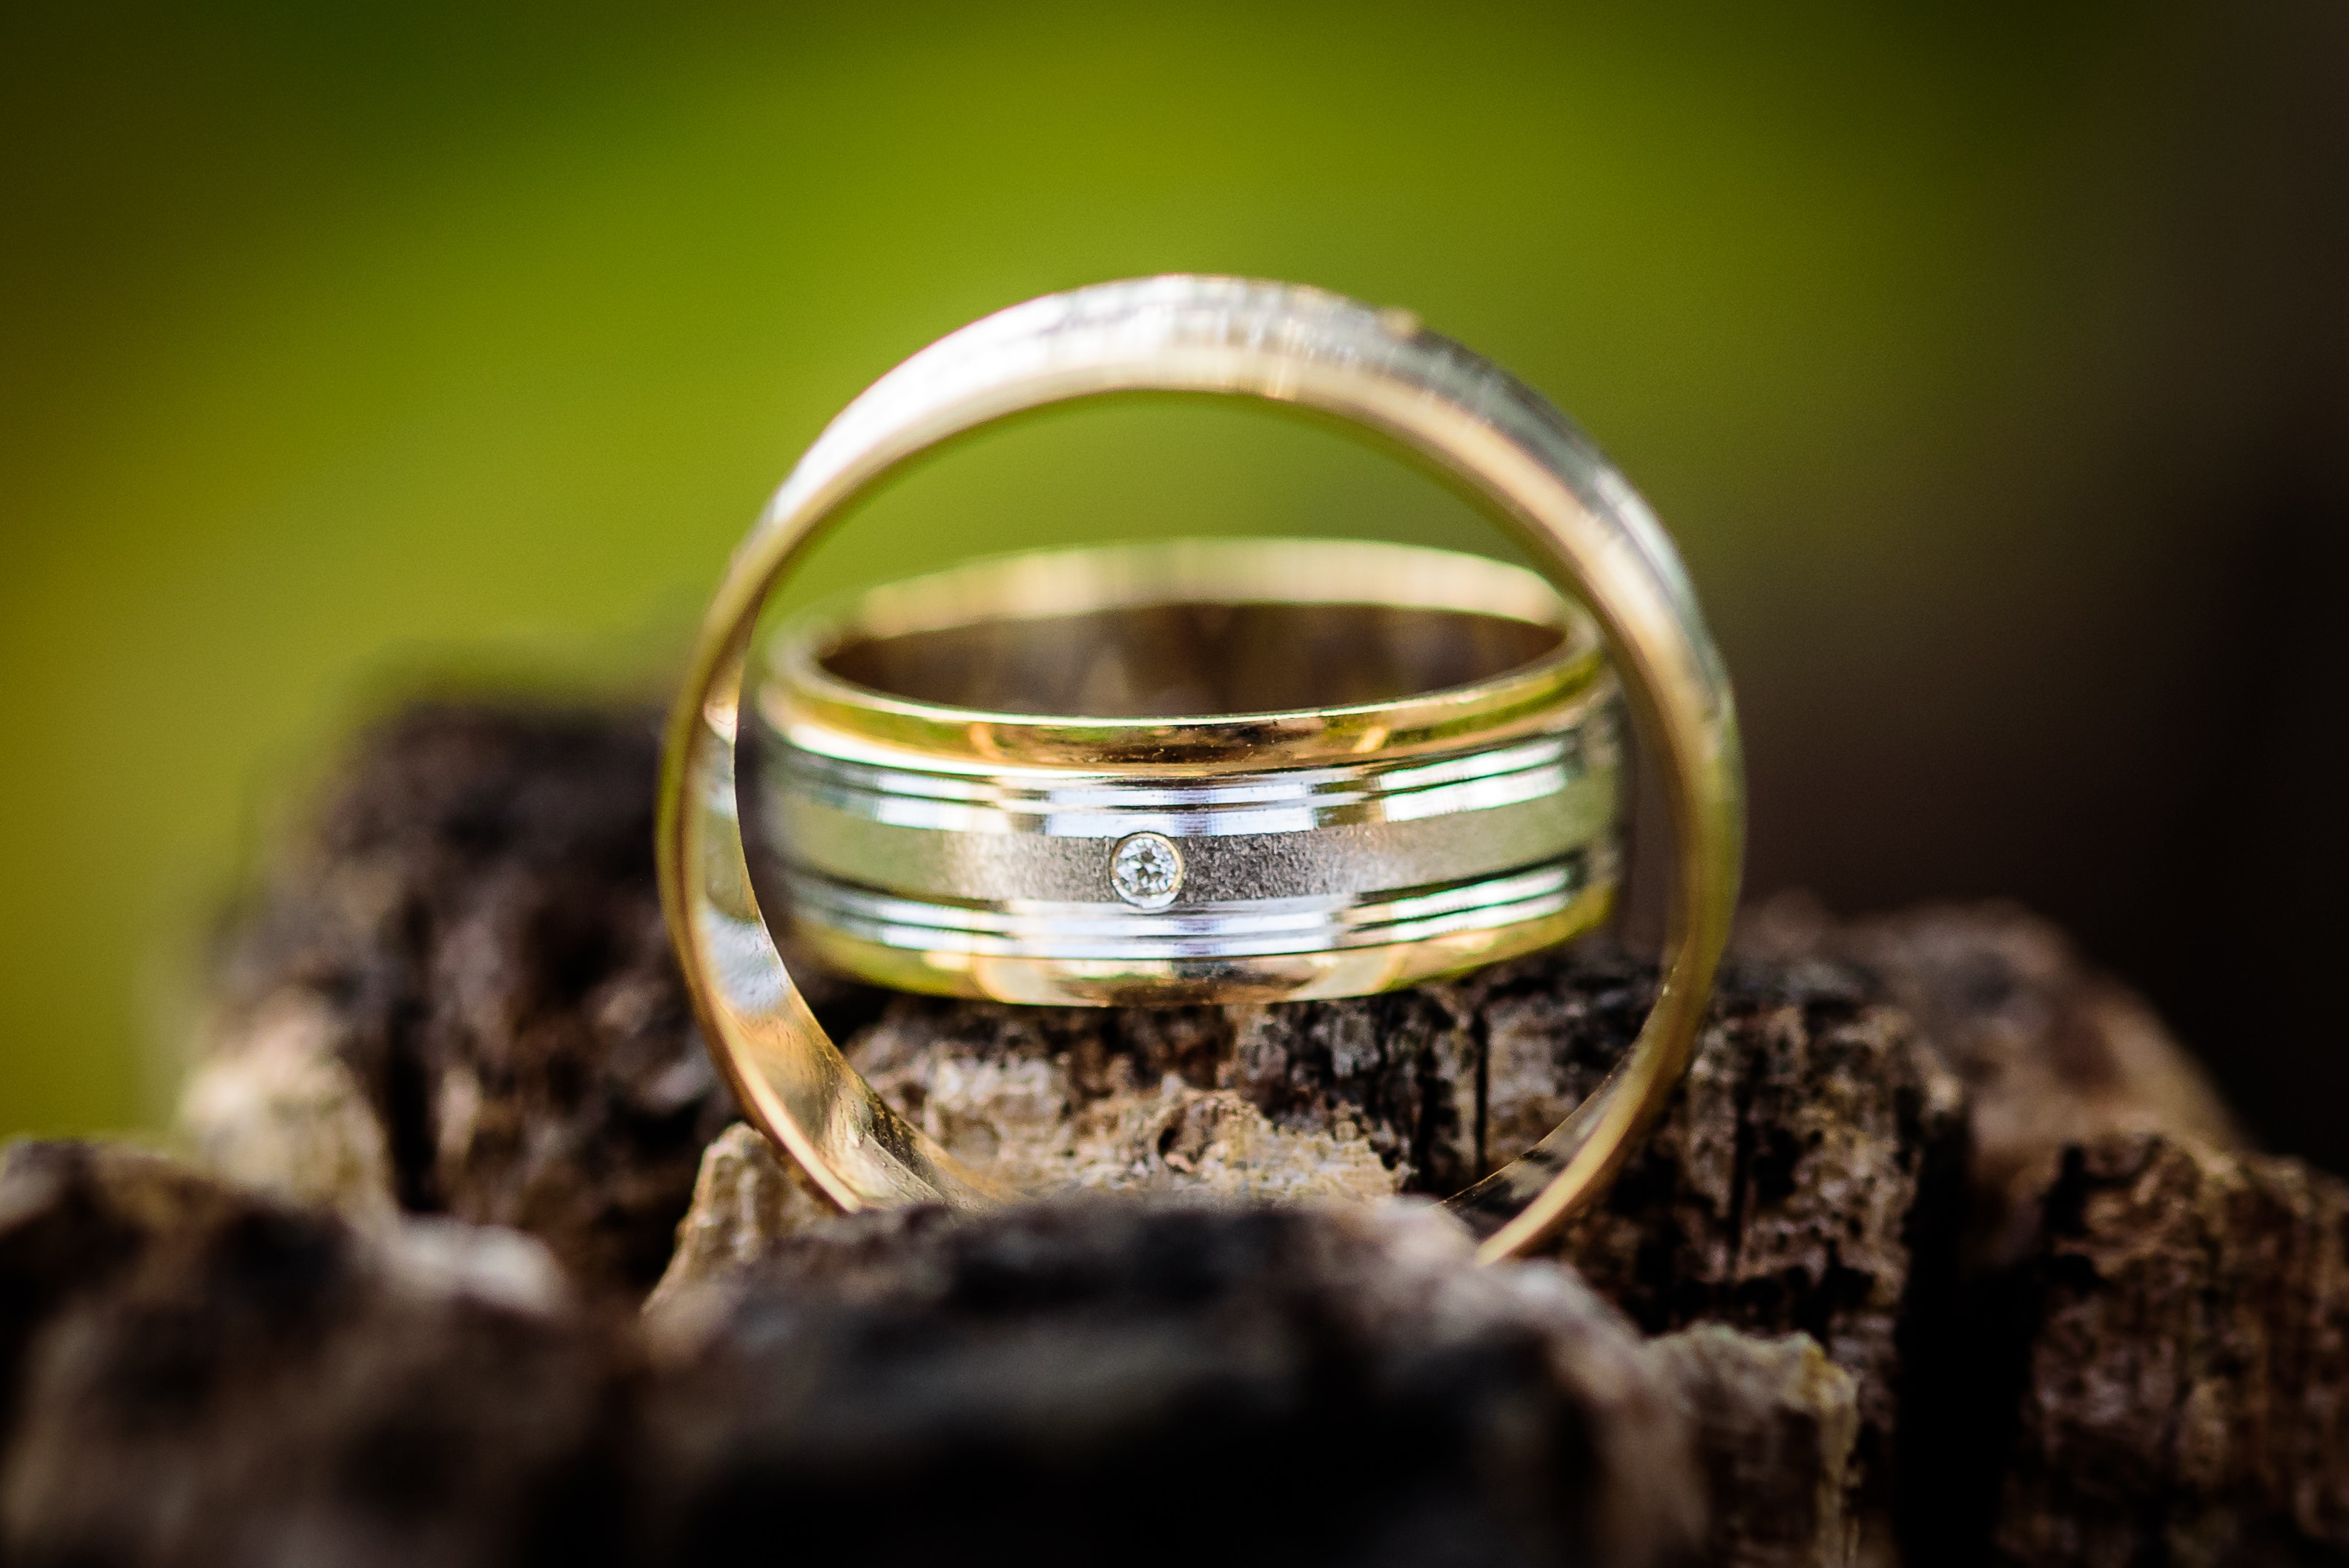 500+ Engaging Wedding Rings Photos · Pexels · Free Stock ...